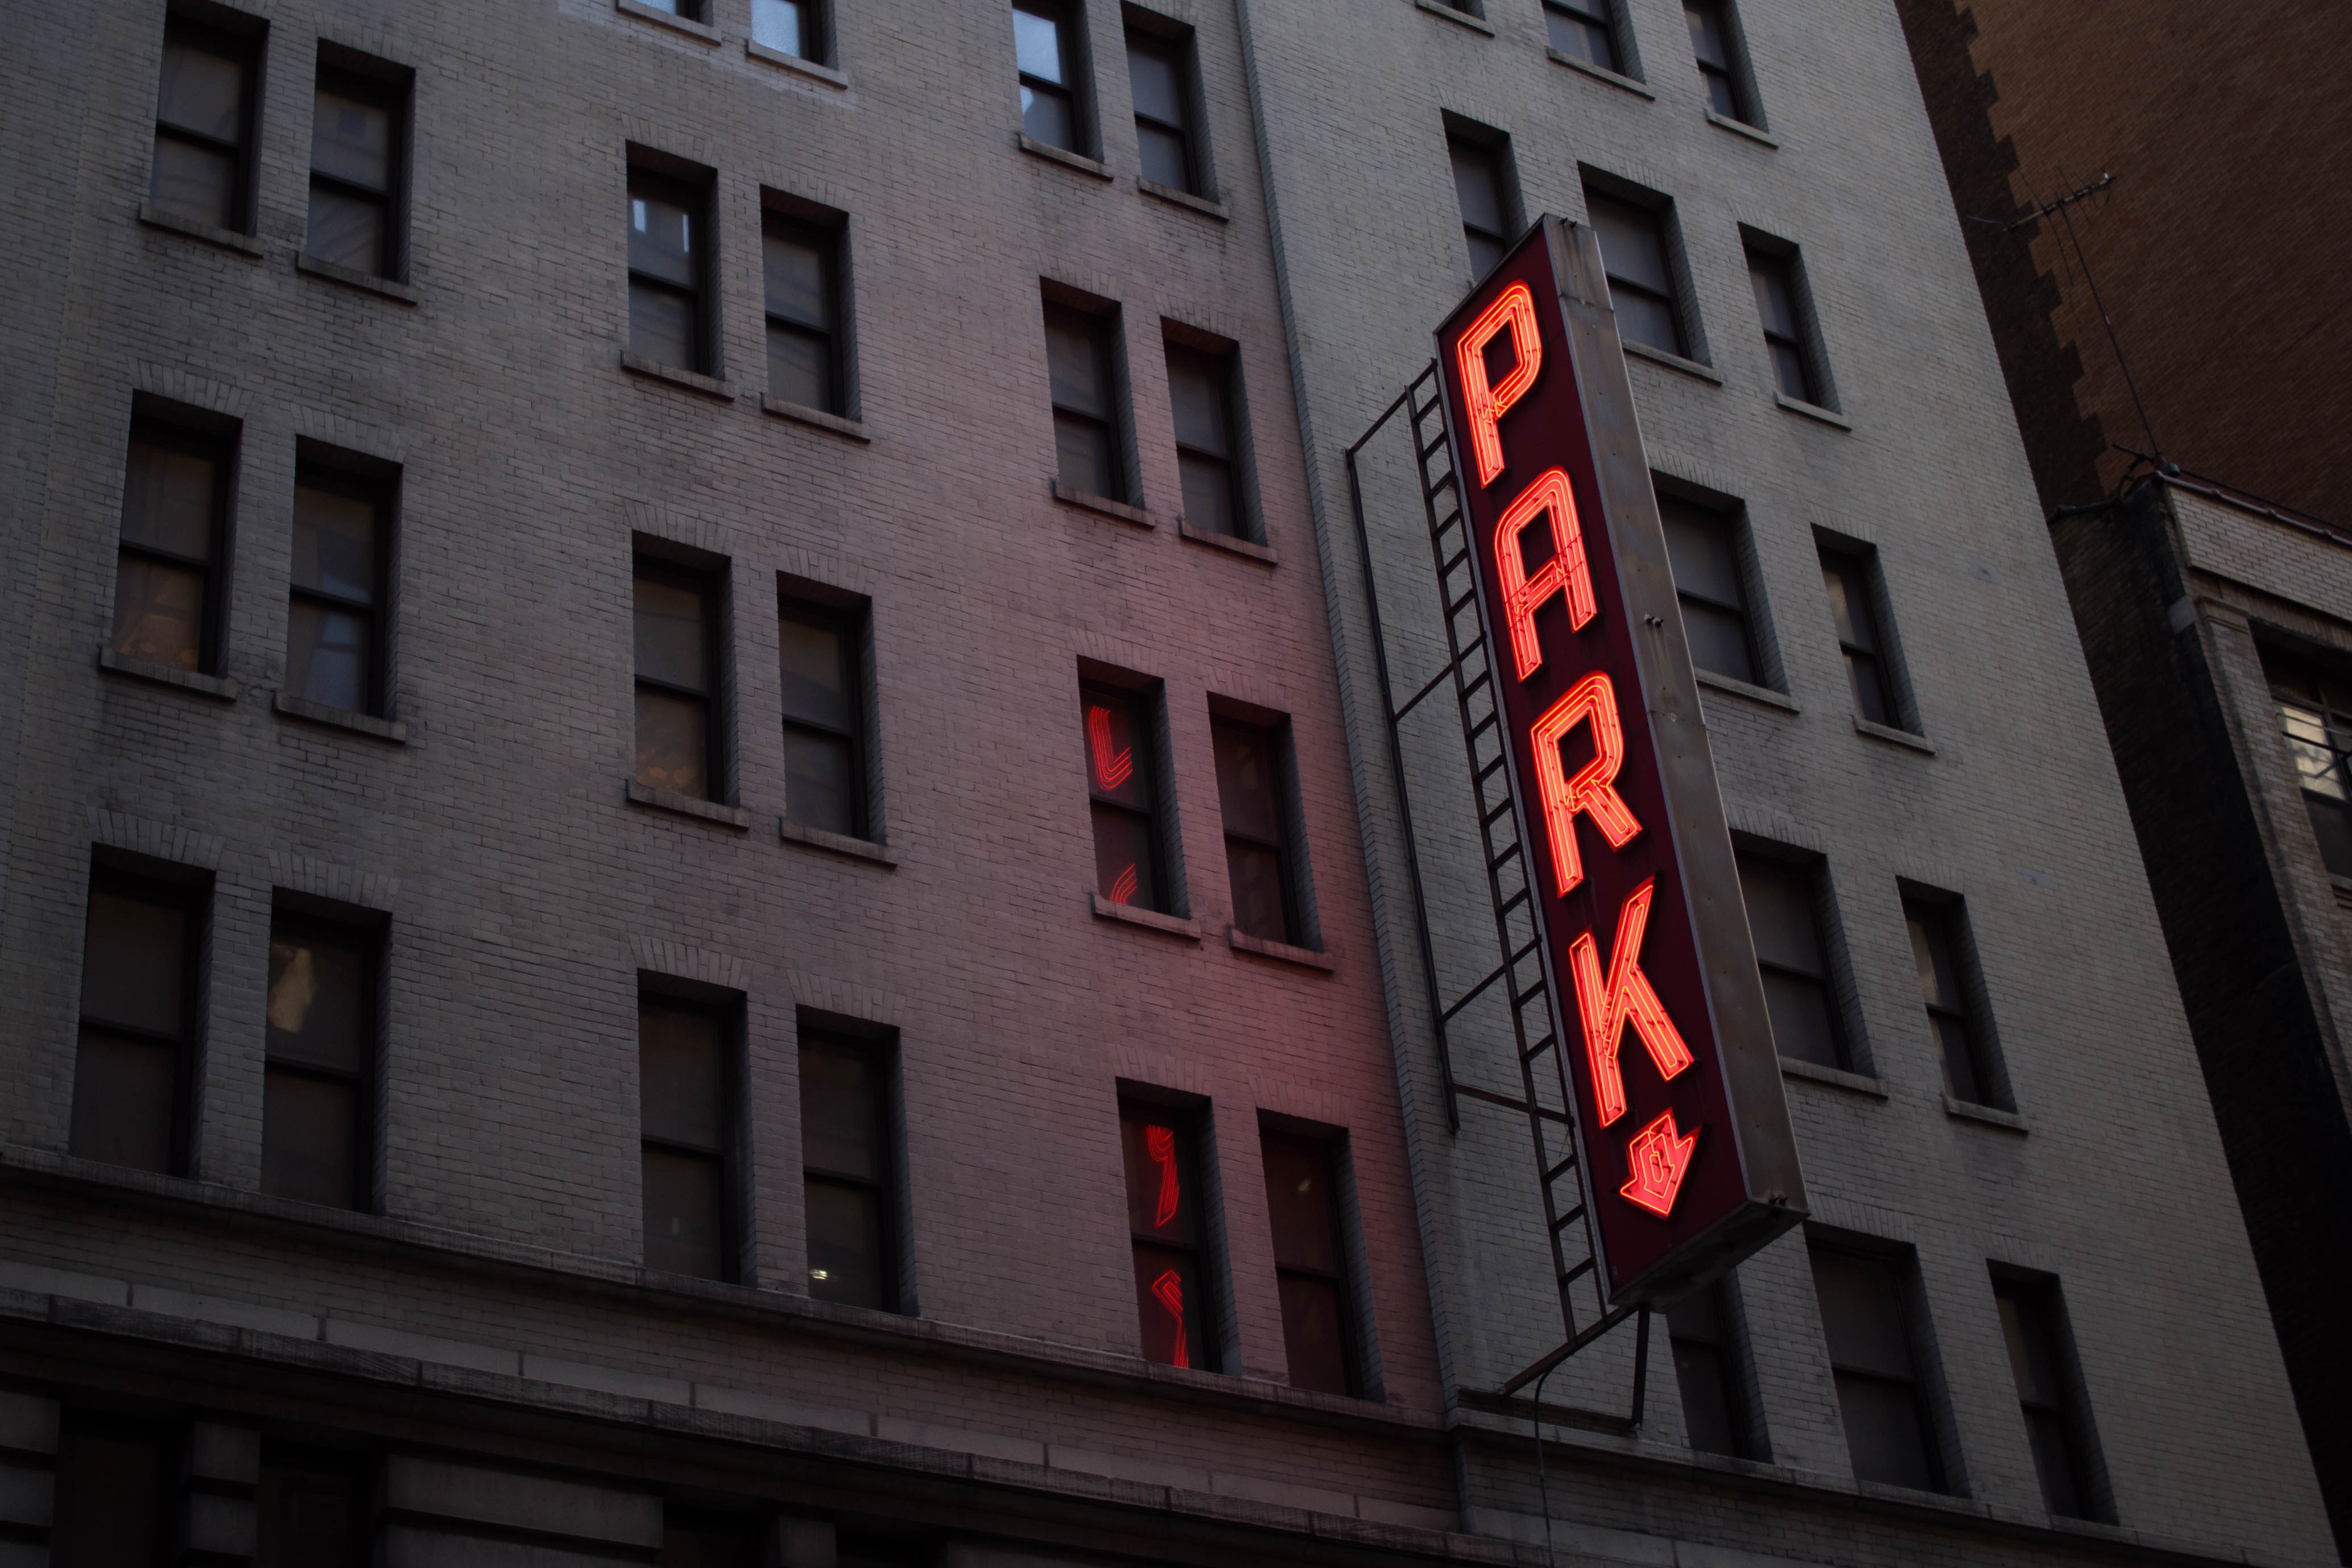 red Park light signage on gray concrete building